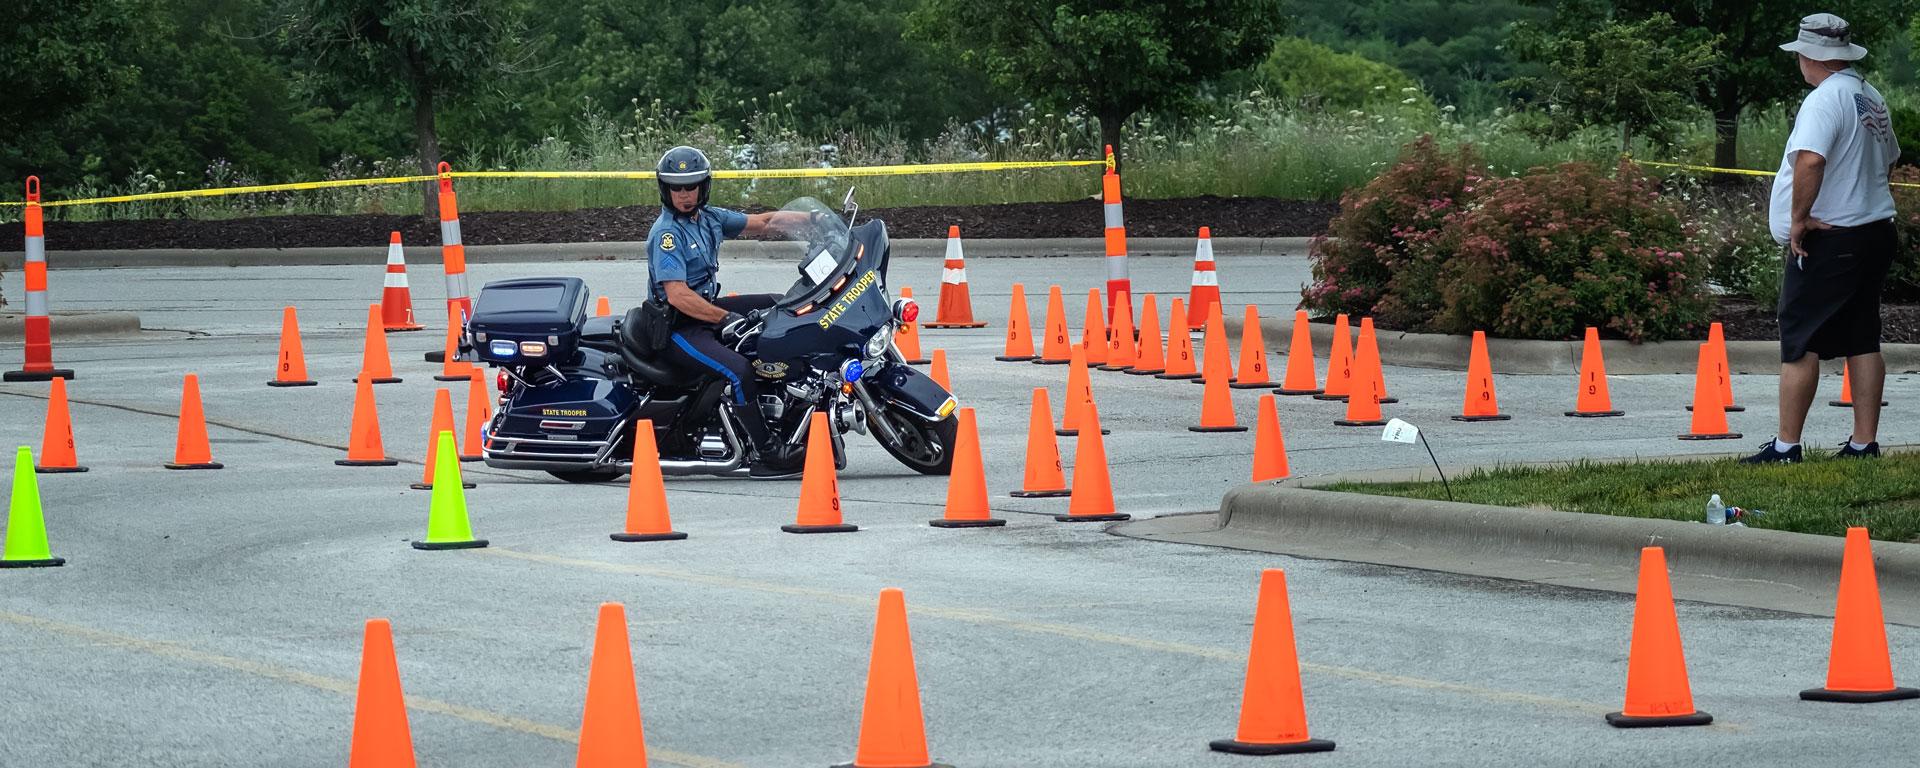 national law enforcement week motorcycle rodeo